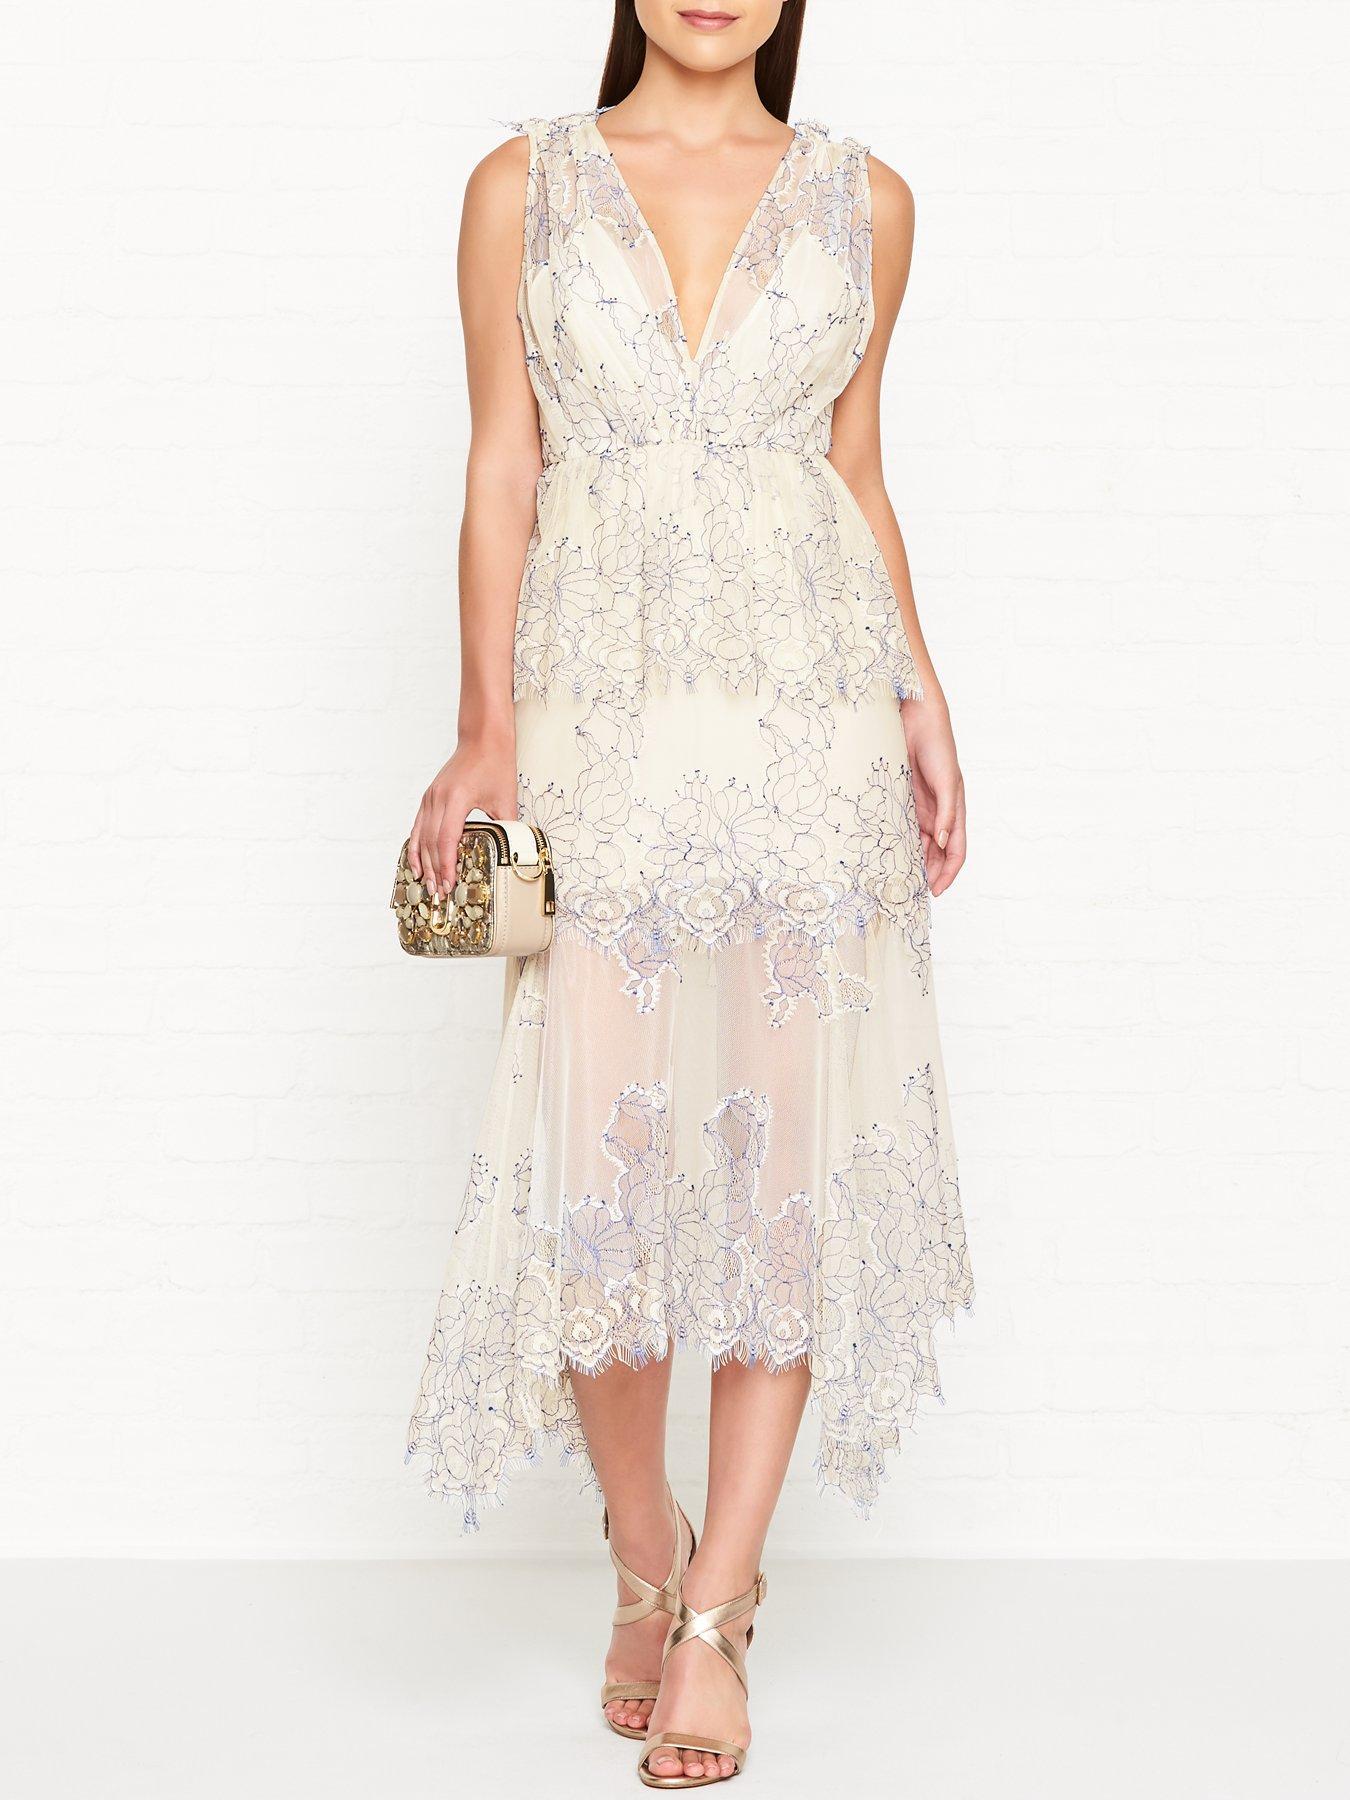 ALICE MCCALL Clementine Lace Sleeveless Midi Cream Dress